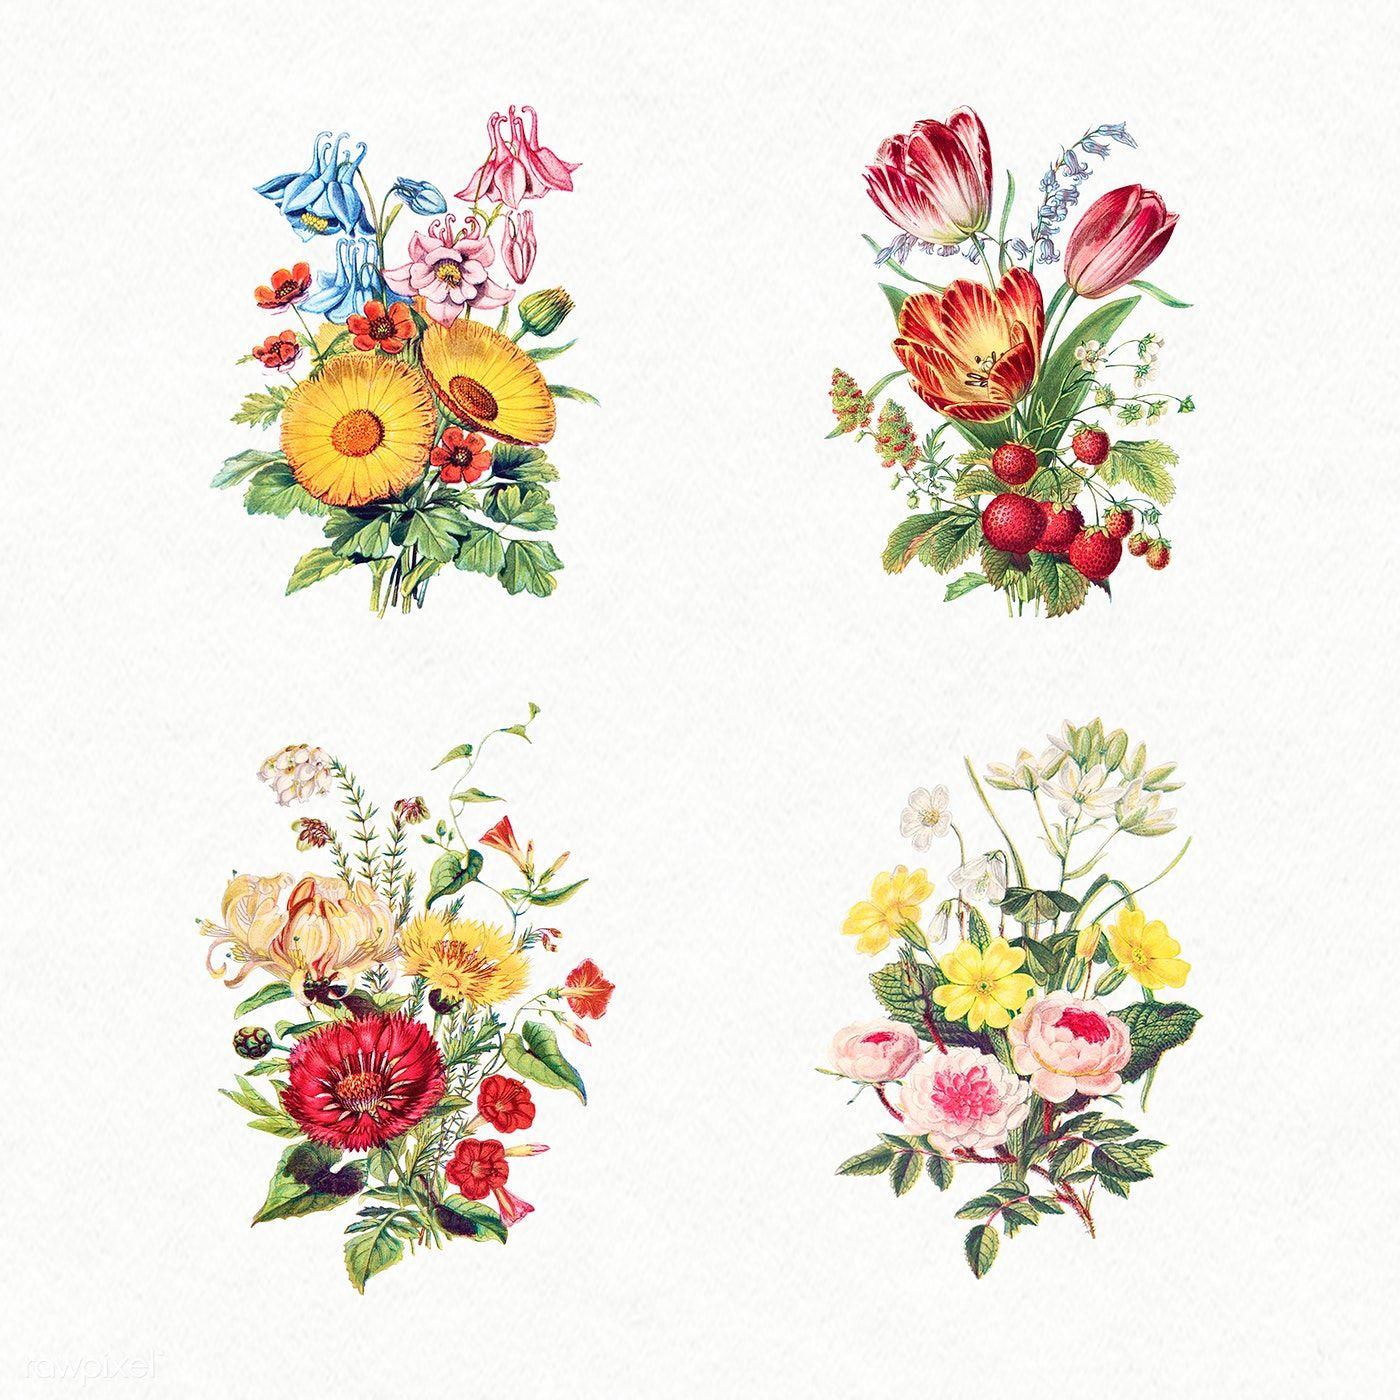 Trendy Vintage Flowers Poster Botanical Prints Ideas Flower Bouquet Tattoo Flower Drawing Vintage Flowers